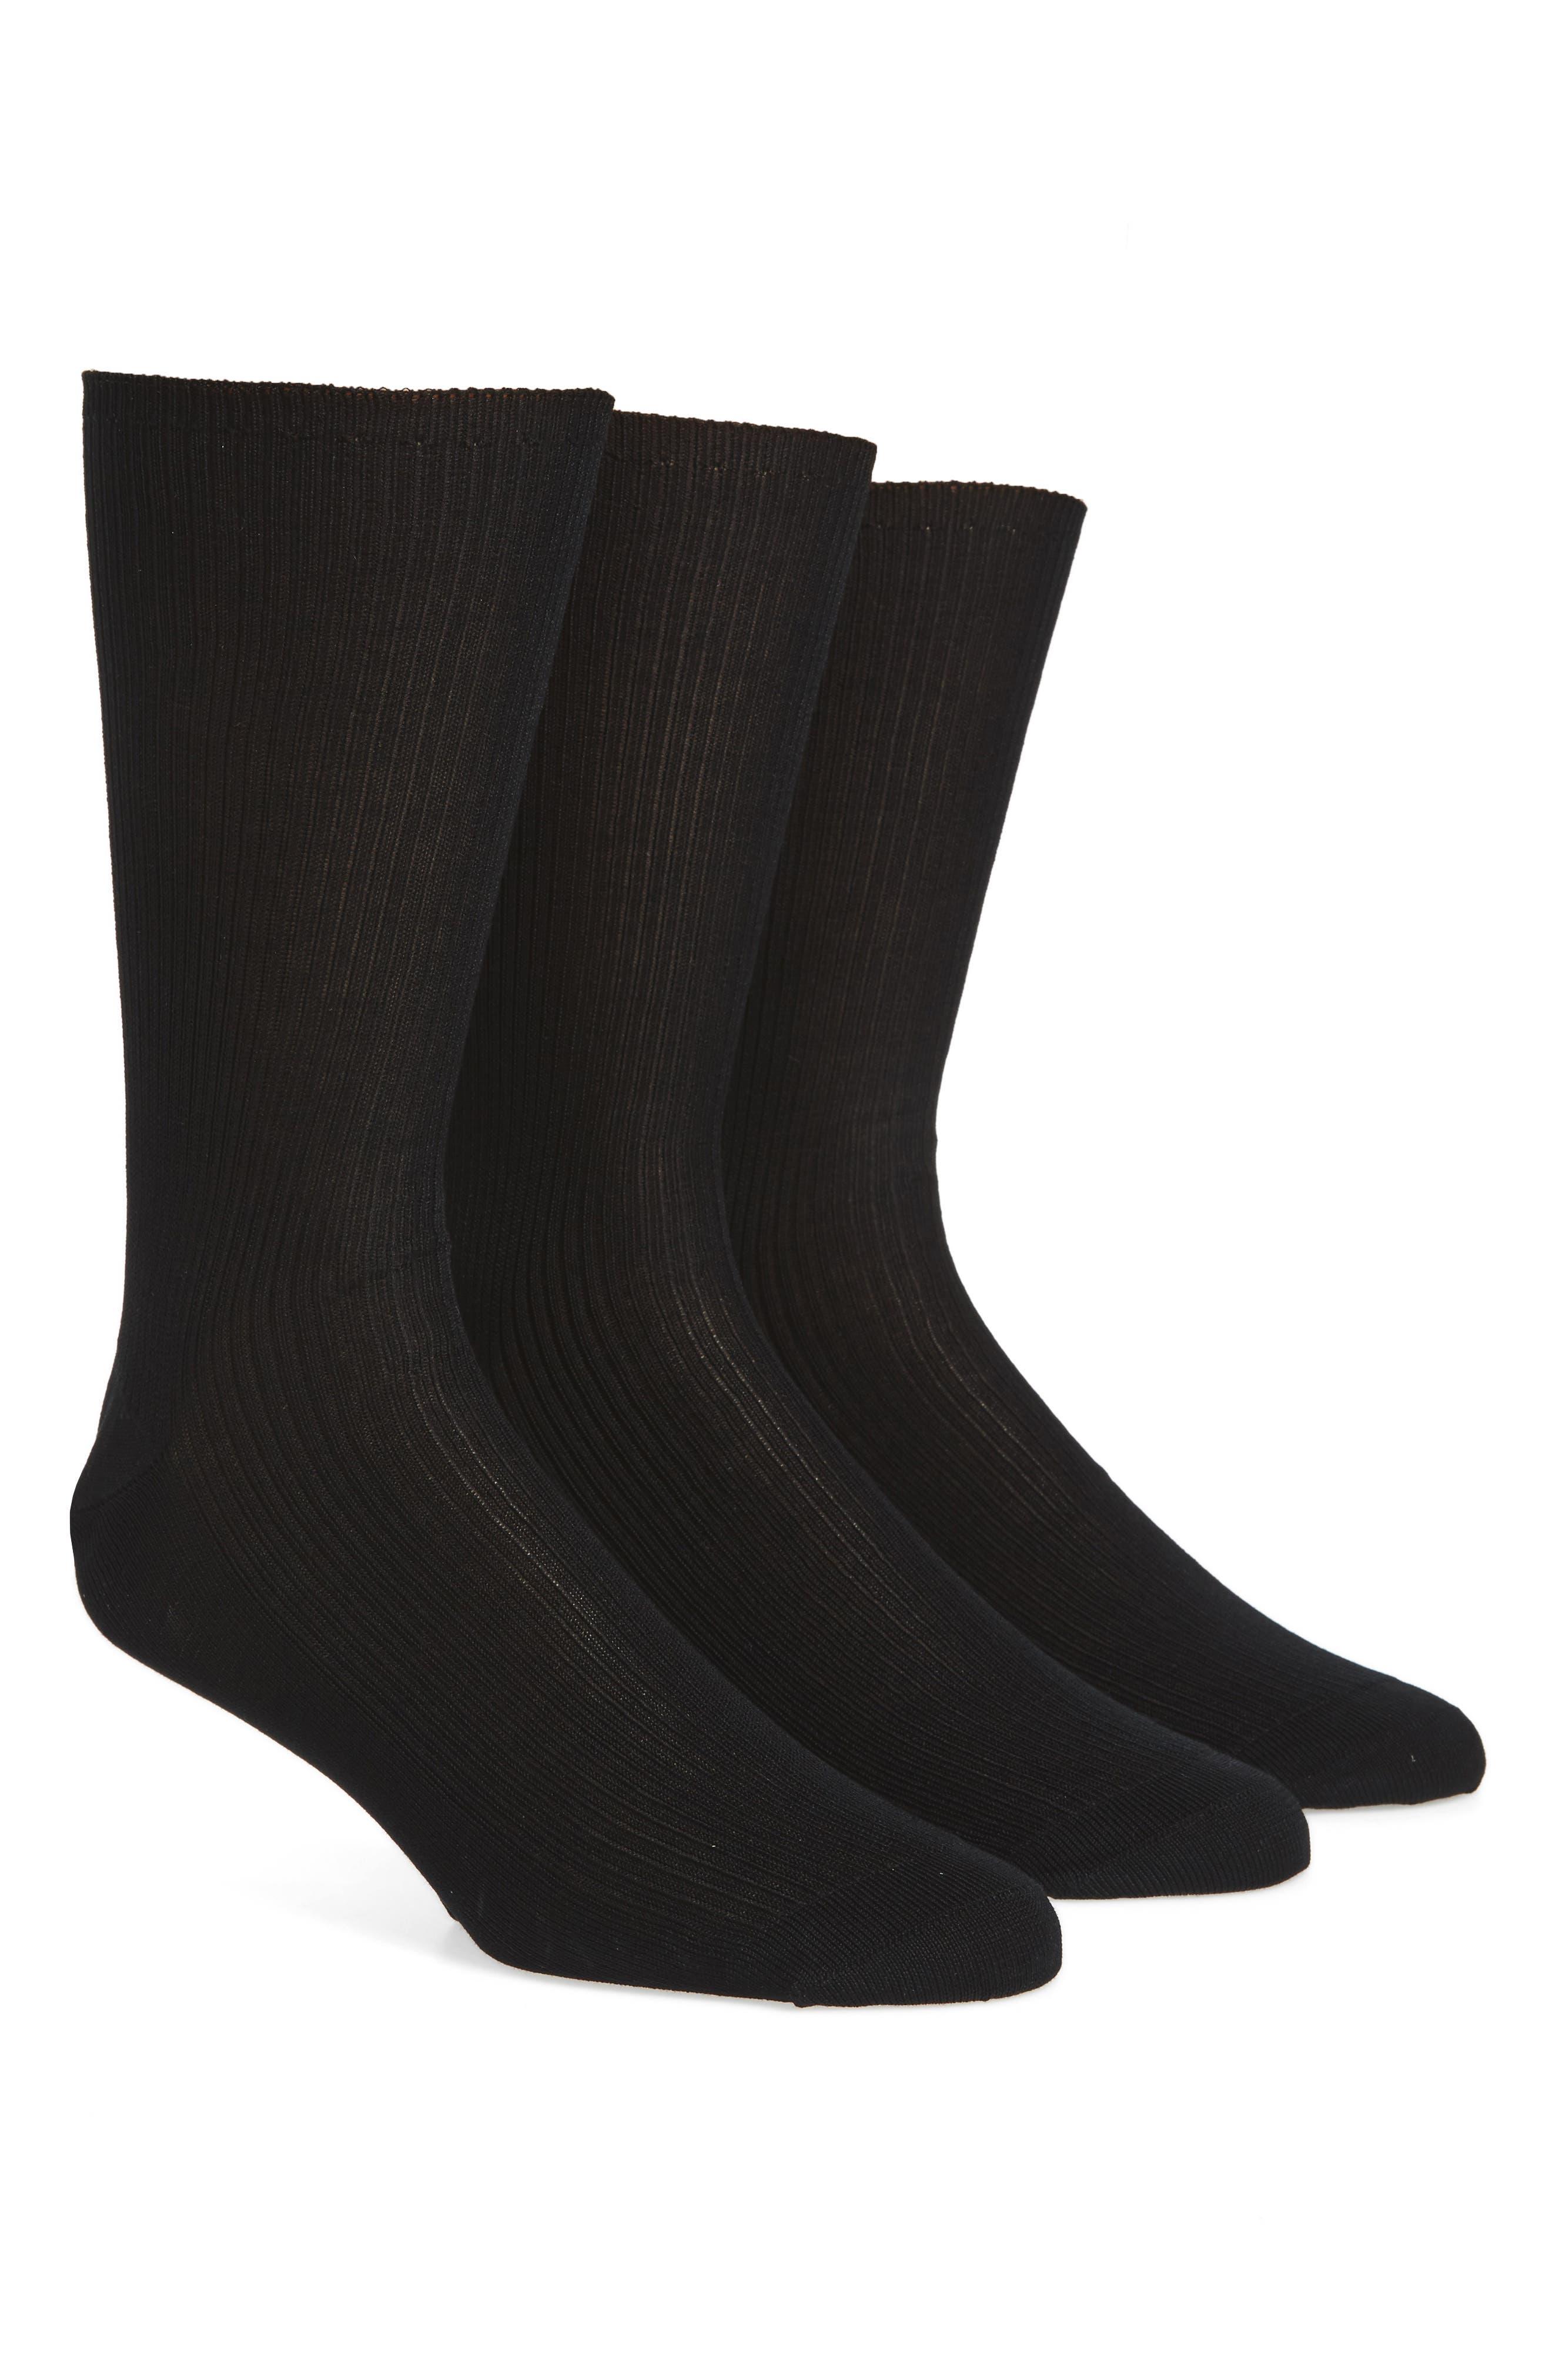 Calvin Klein Cotton Blend Dress Socks (3-Pack)